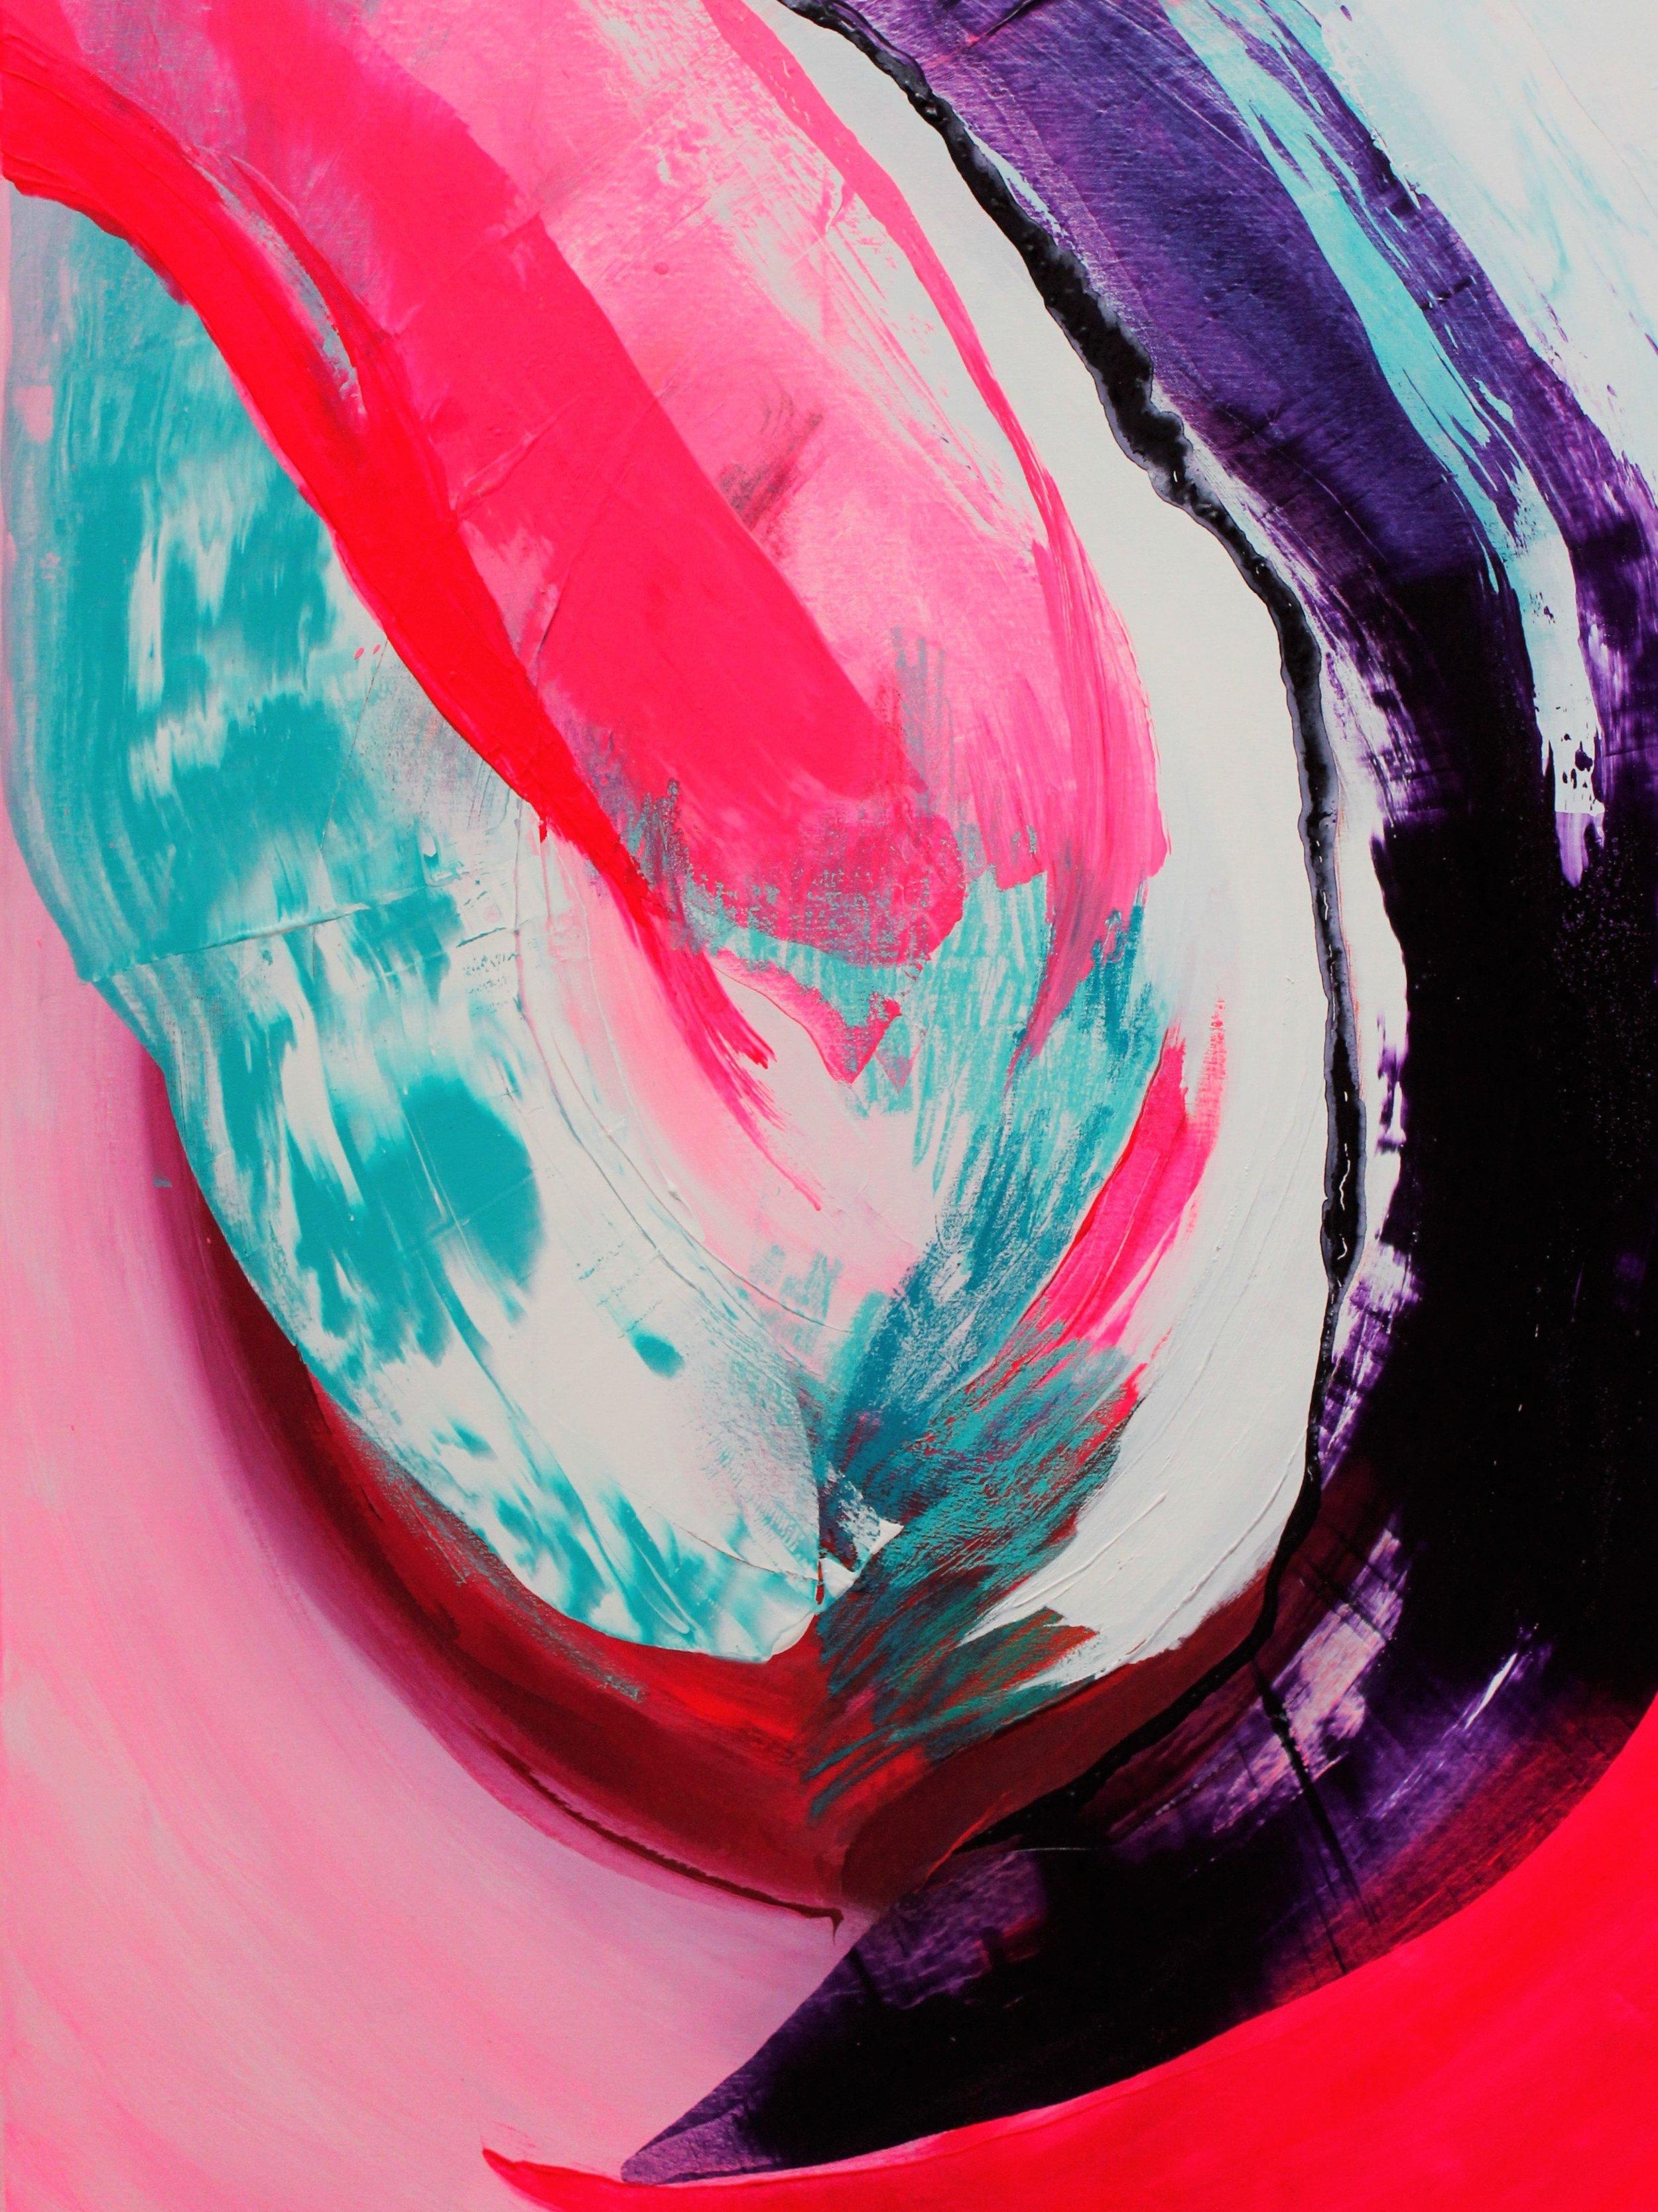 Sulka, Akryyli, pigmentti & pastelli kankaalle, 150 cm x 100 cm  Myynnissä / For sale